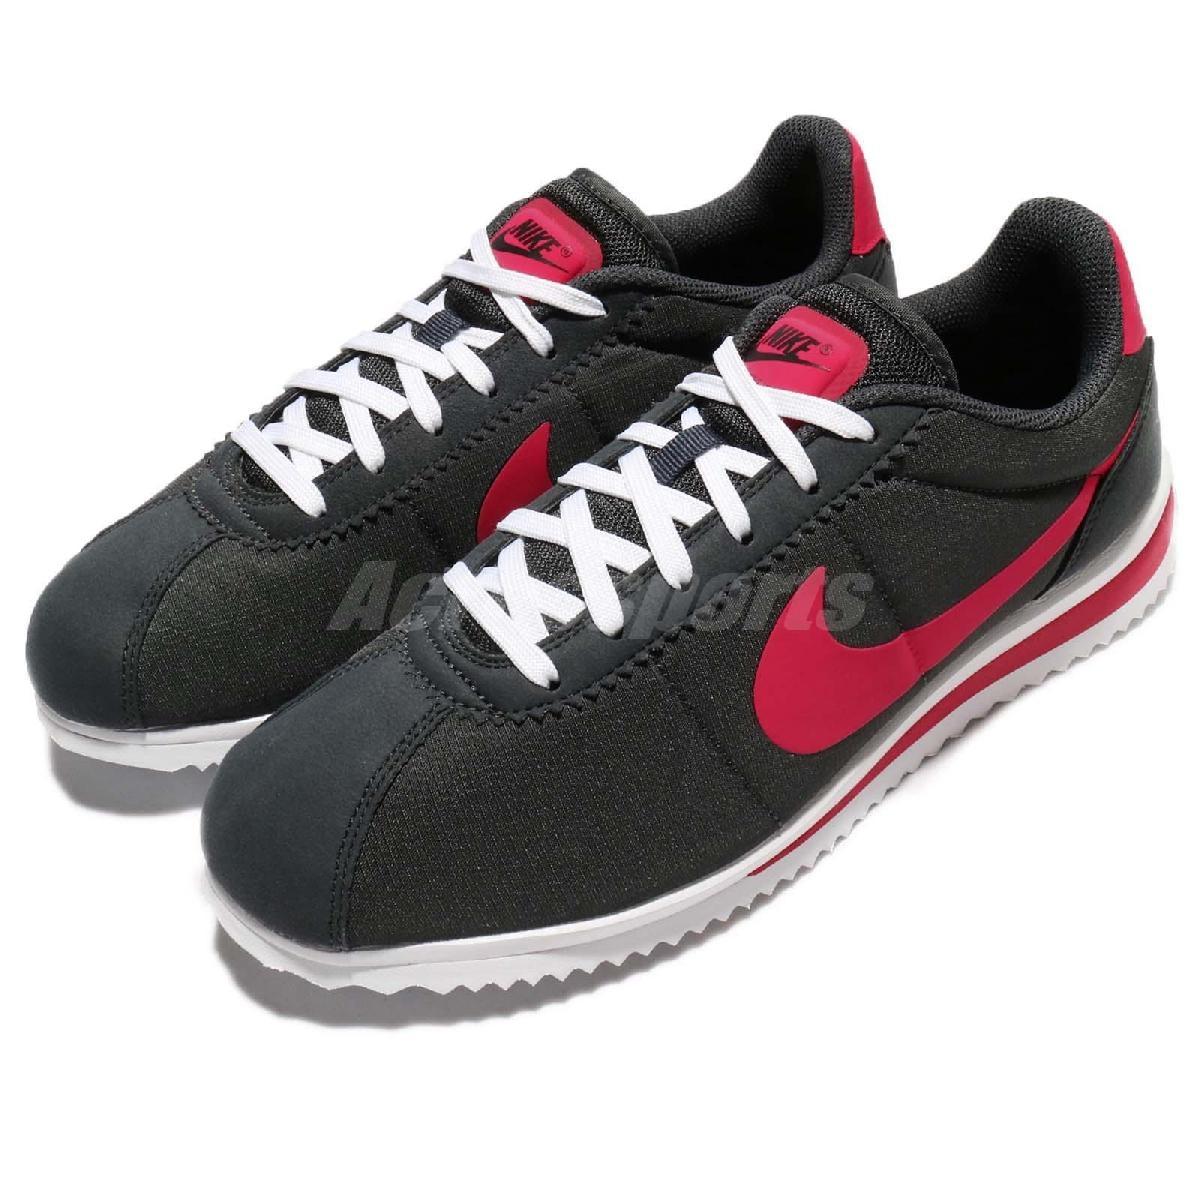 Nike阿甘鞋Cortez Ultra SD黑桃紅輕量版本復古慢跑鞋男鞋PUMP306 903893-001